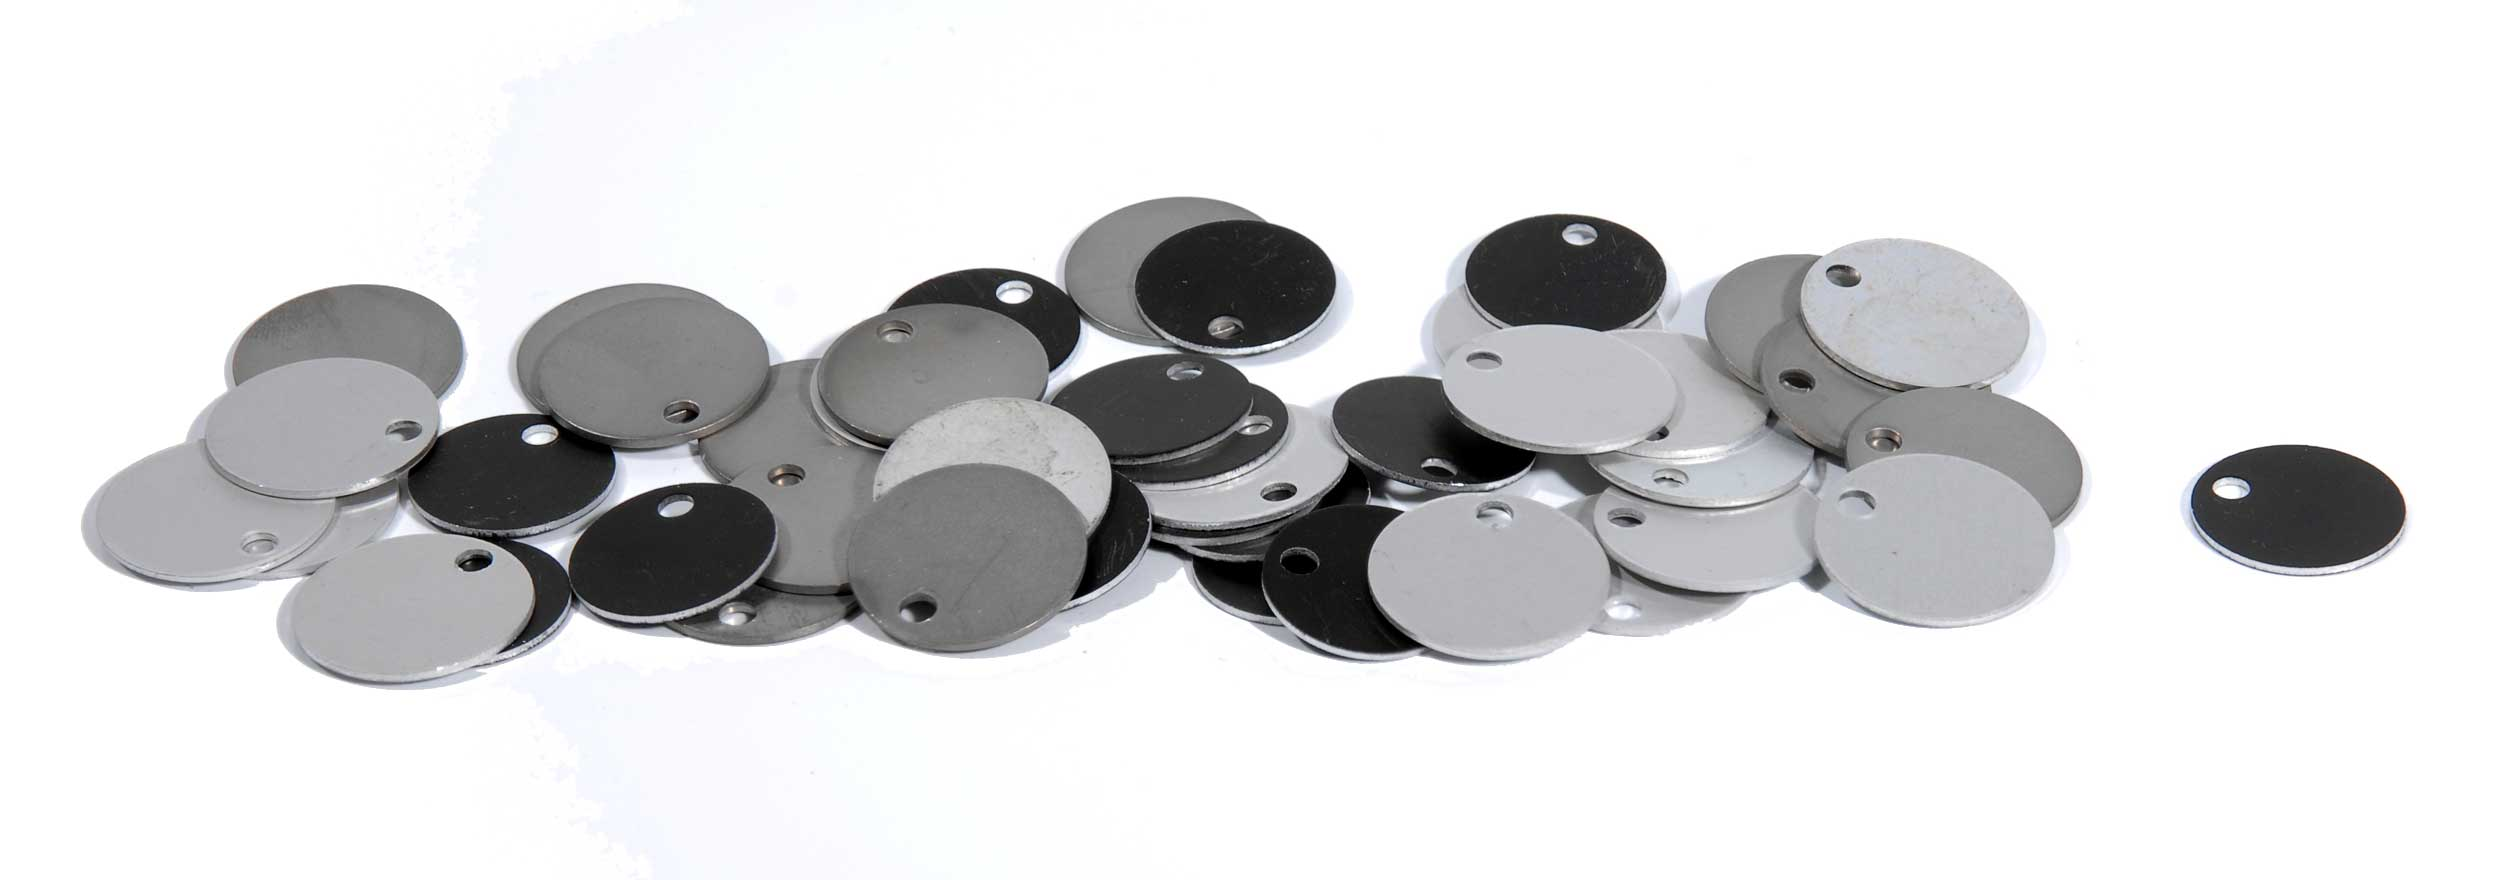 Material Kunststoff schwarz-weiss